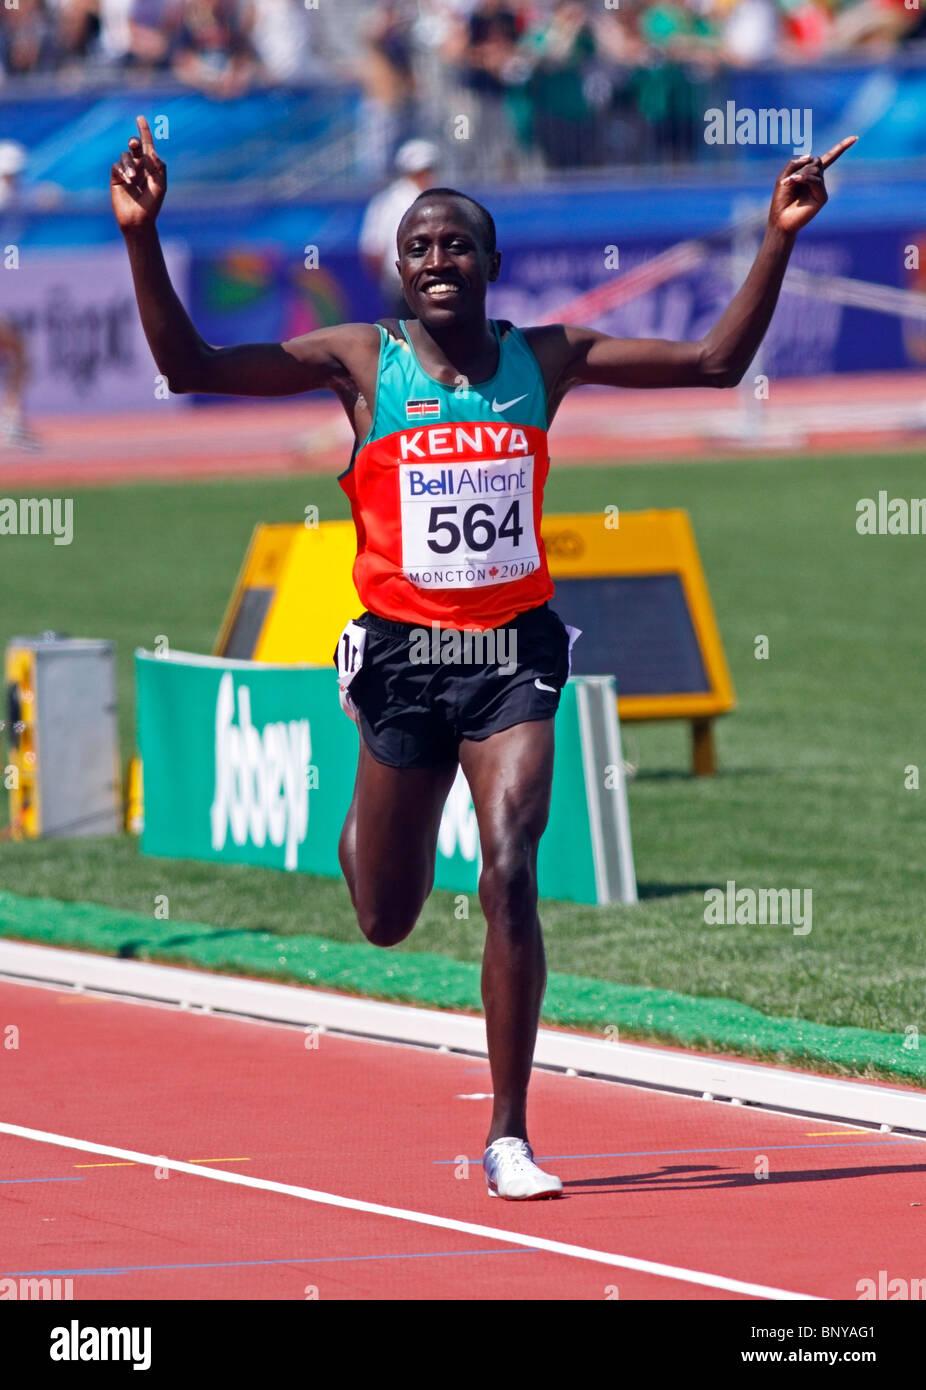 David Kiprotich Bett of Kenya wins the men's 5000 metres at the 2010 IAAF World Junior Championships July 24, - Stock Image